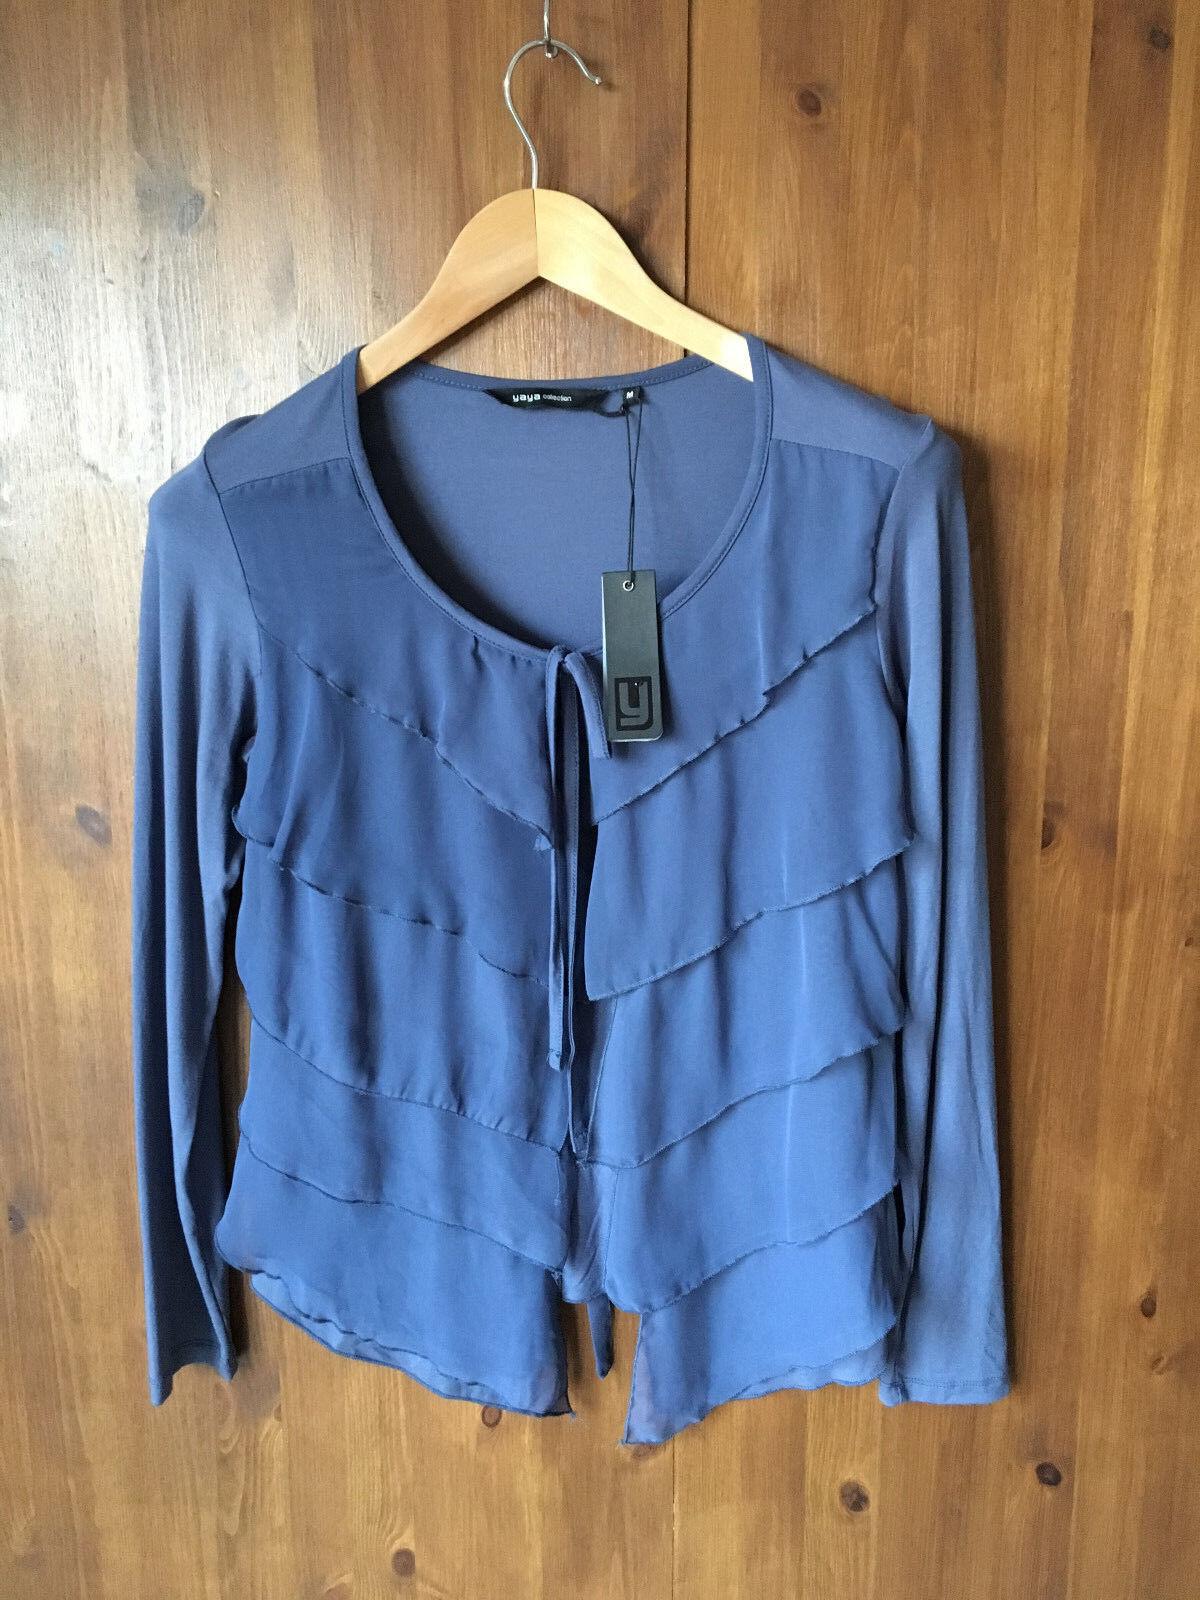 Collection YAYA YAYA YAYA gris bleu à volants Front Jersey Cardigan M/UK 12/EUR 40-NEUF fe1b1b